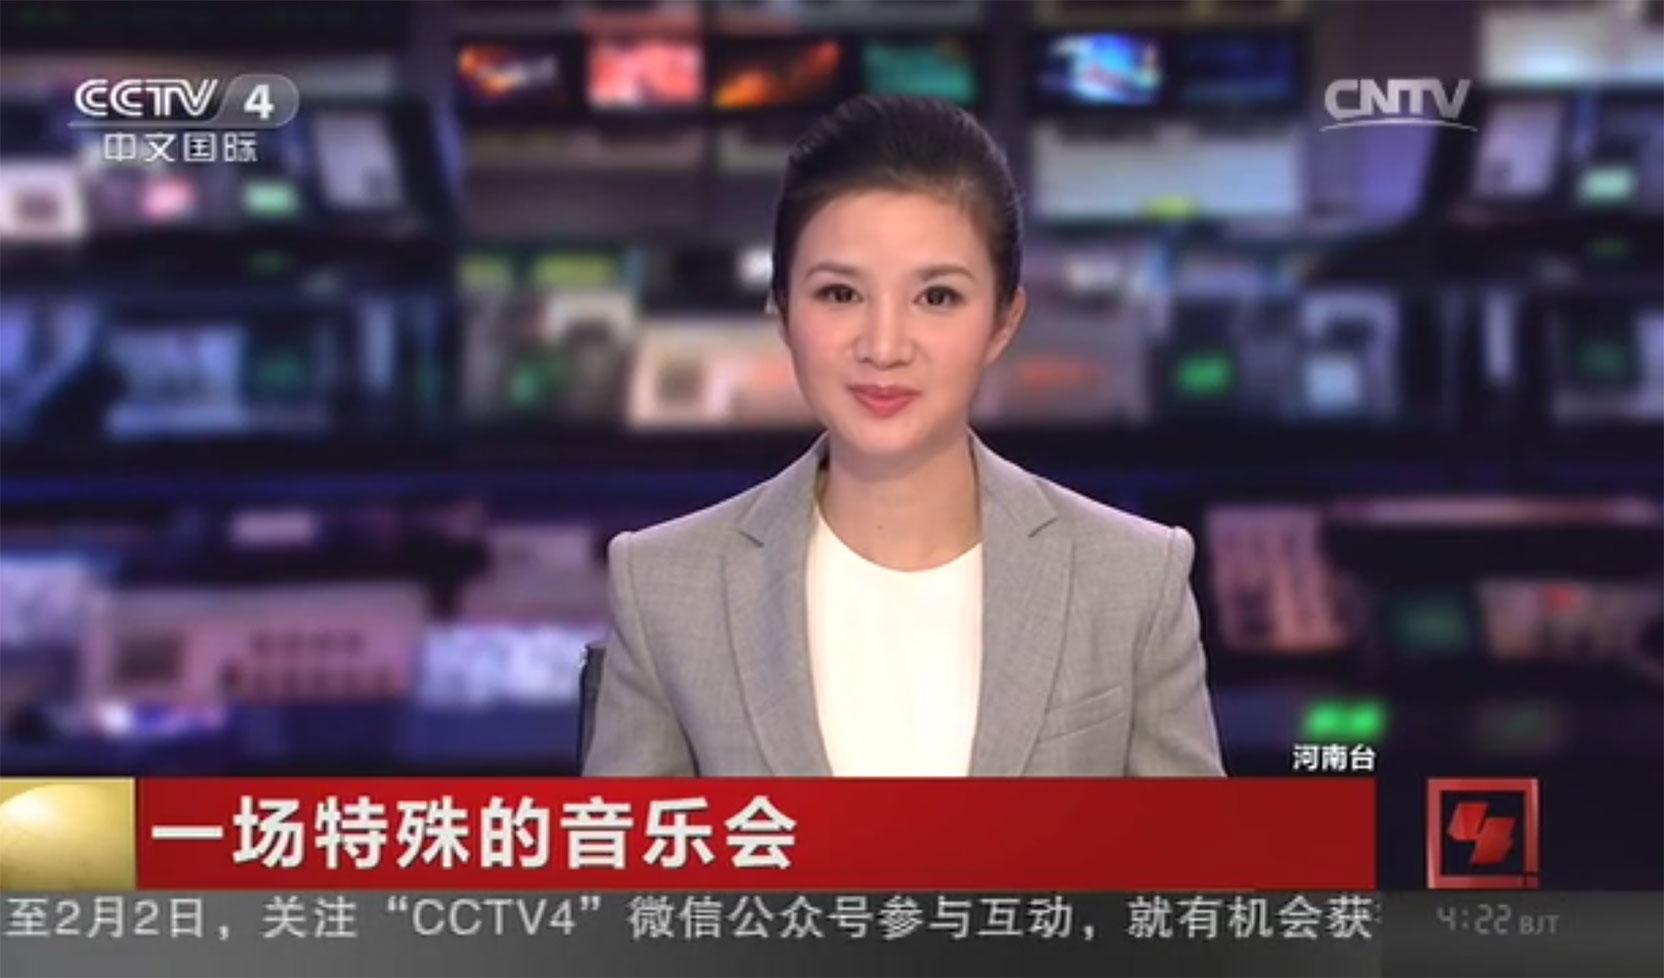 CCTV4中文国际 一场特殊的音乐会